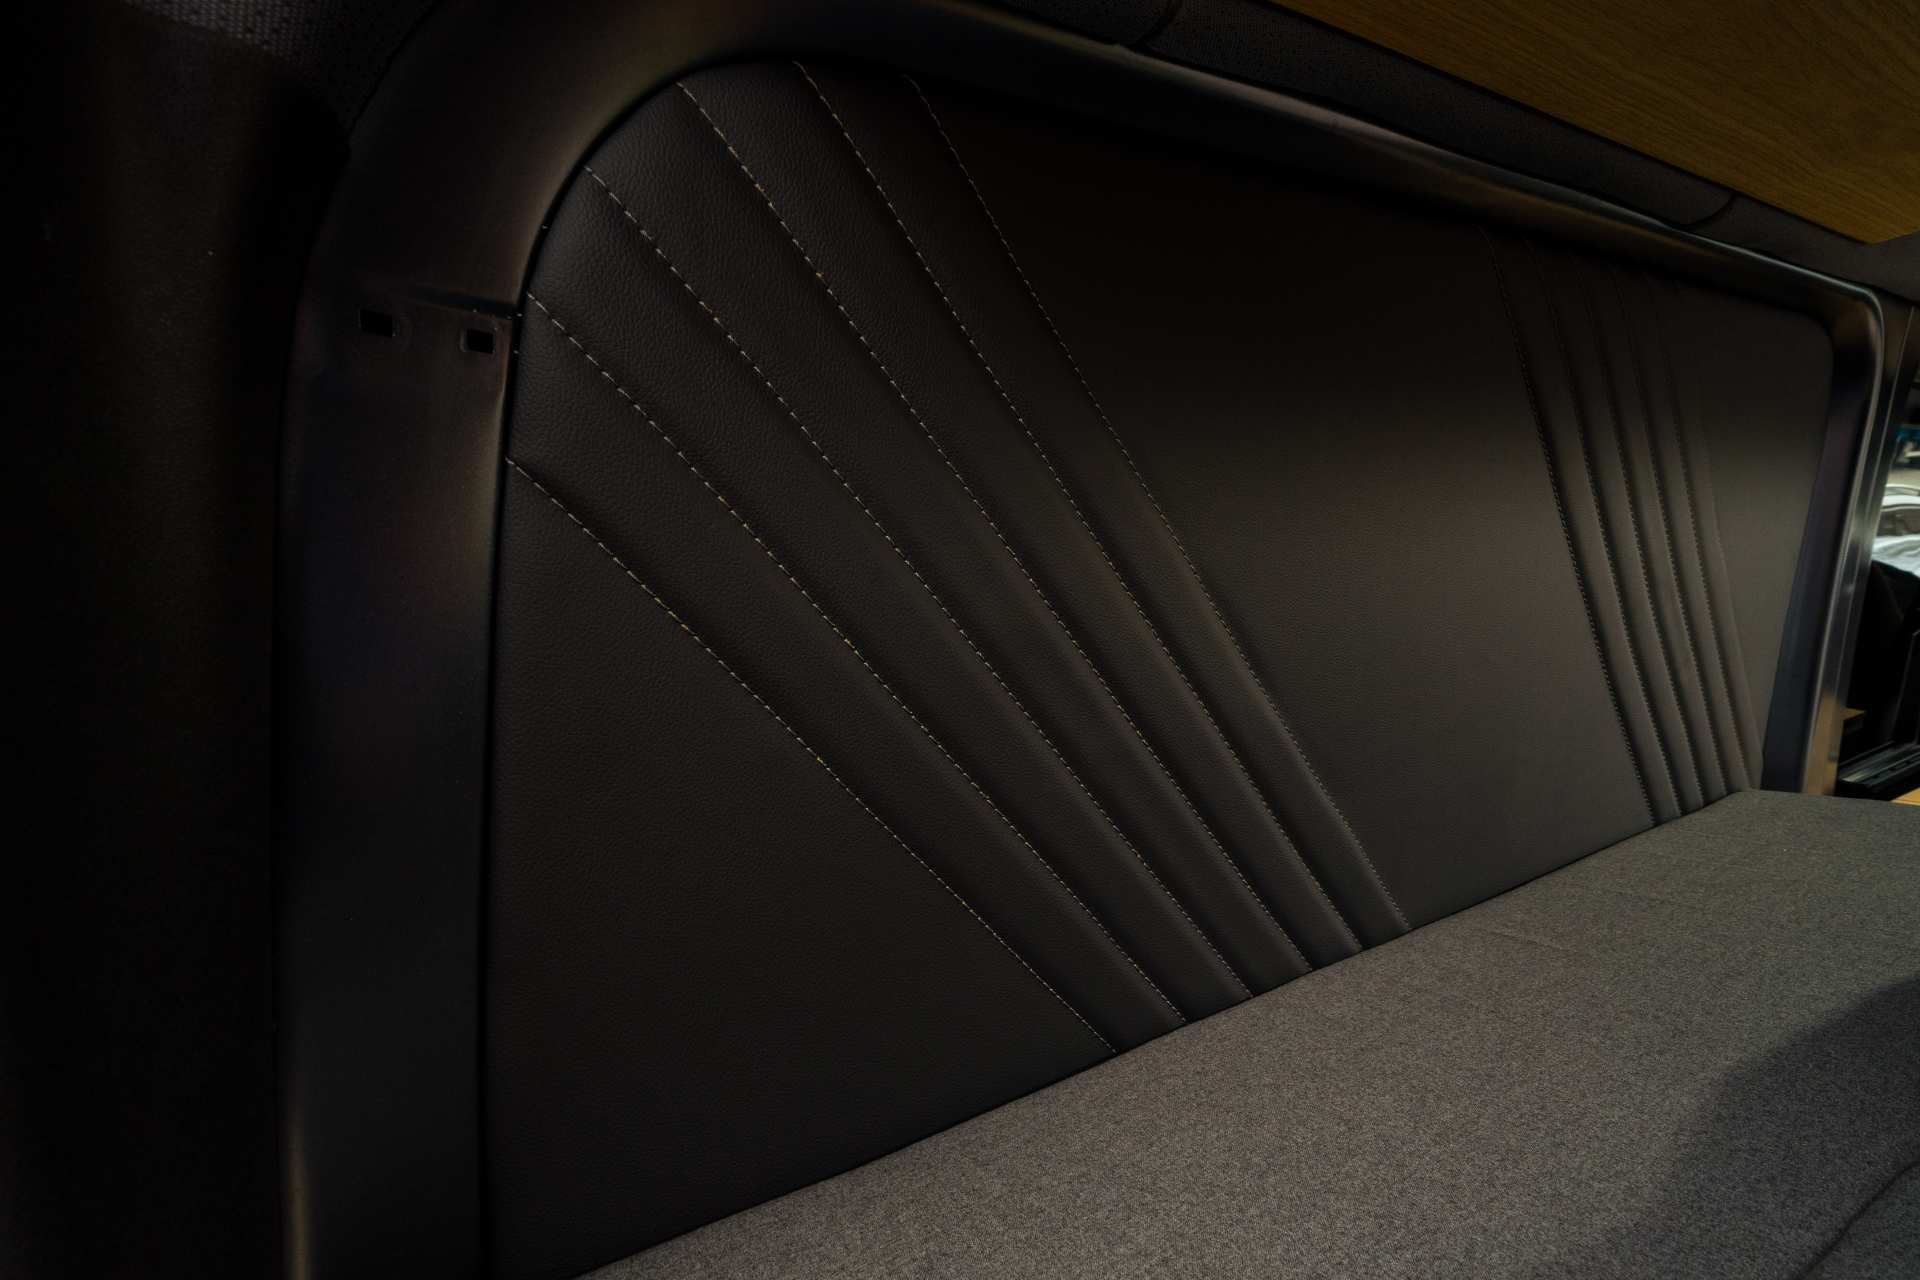 Individualausbau: Mercedes L2 H2 Mixto - 13